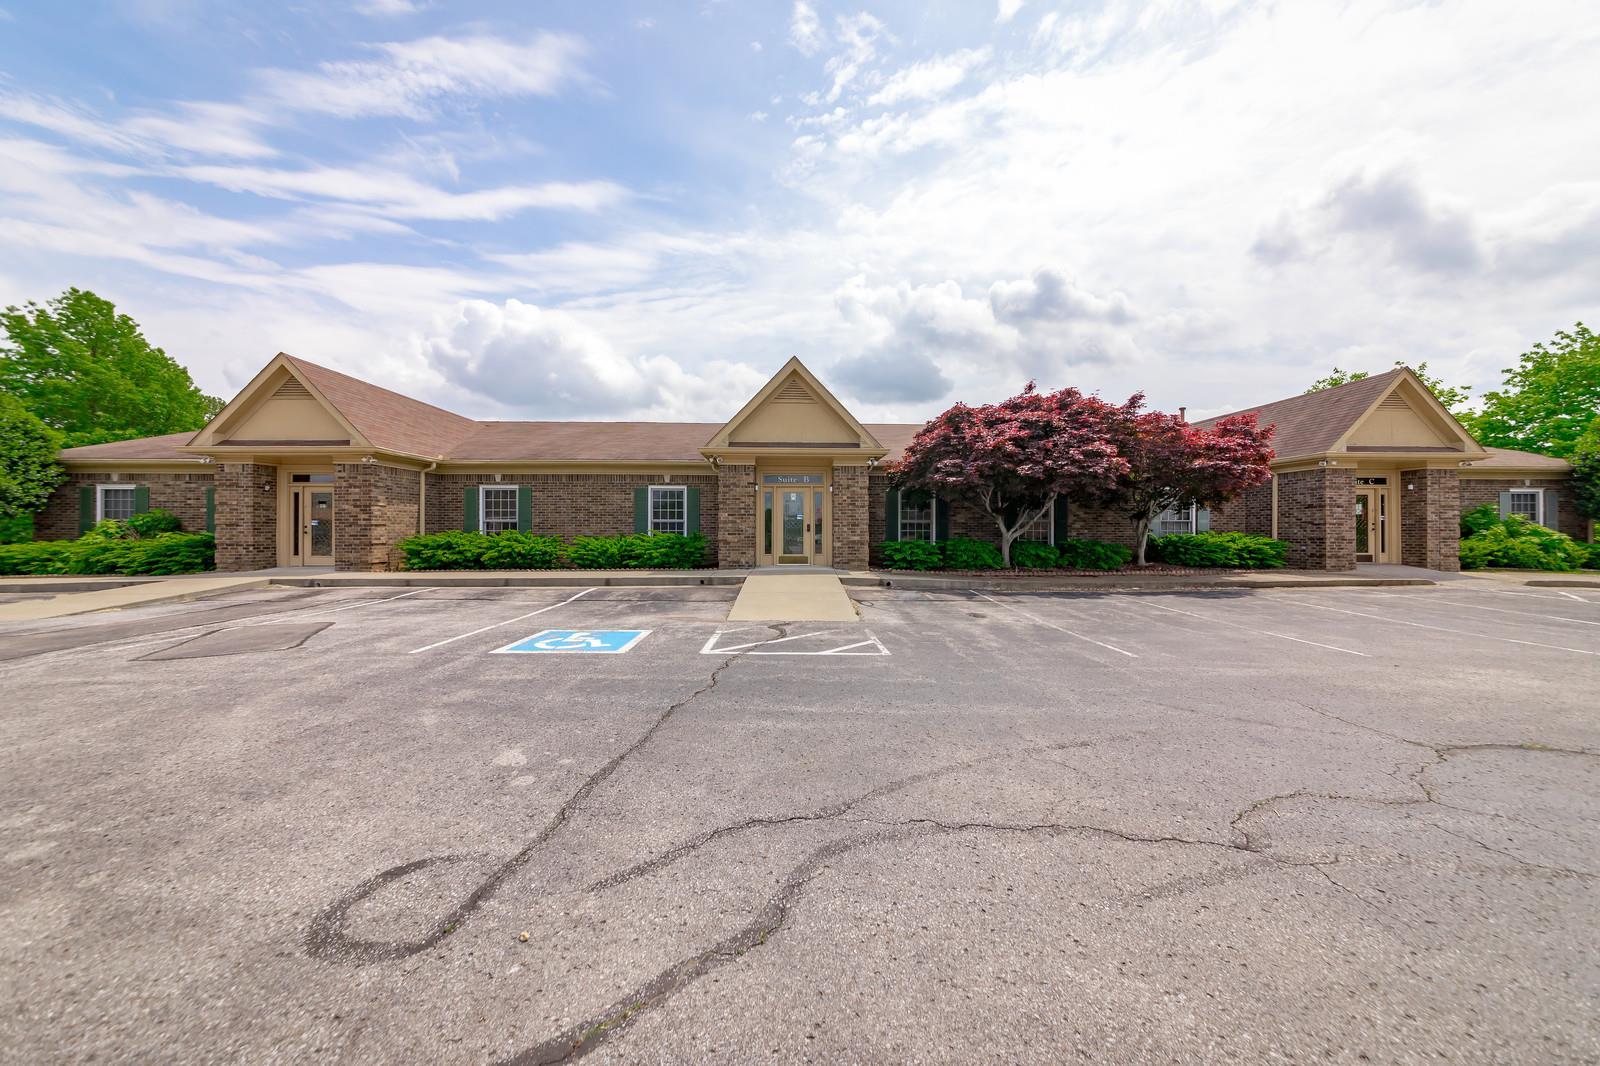 201 Uffelman Drive, Clarksville, TN 37043 - Clarksville, TN real estate listing